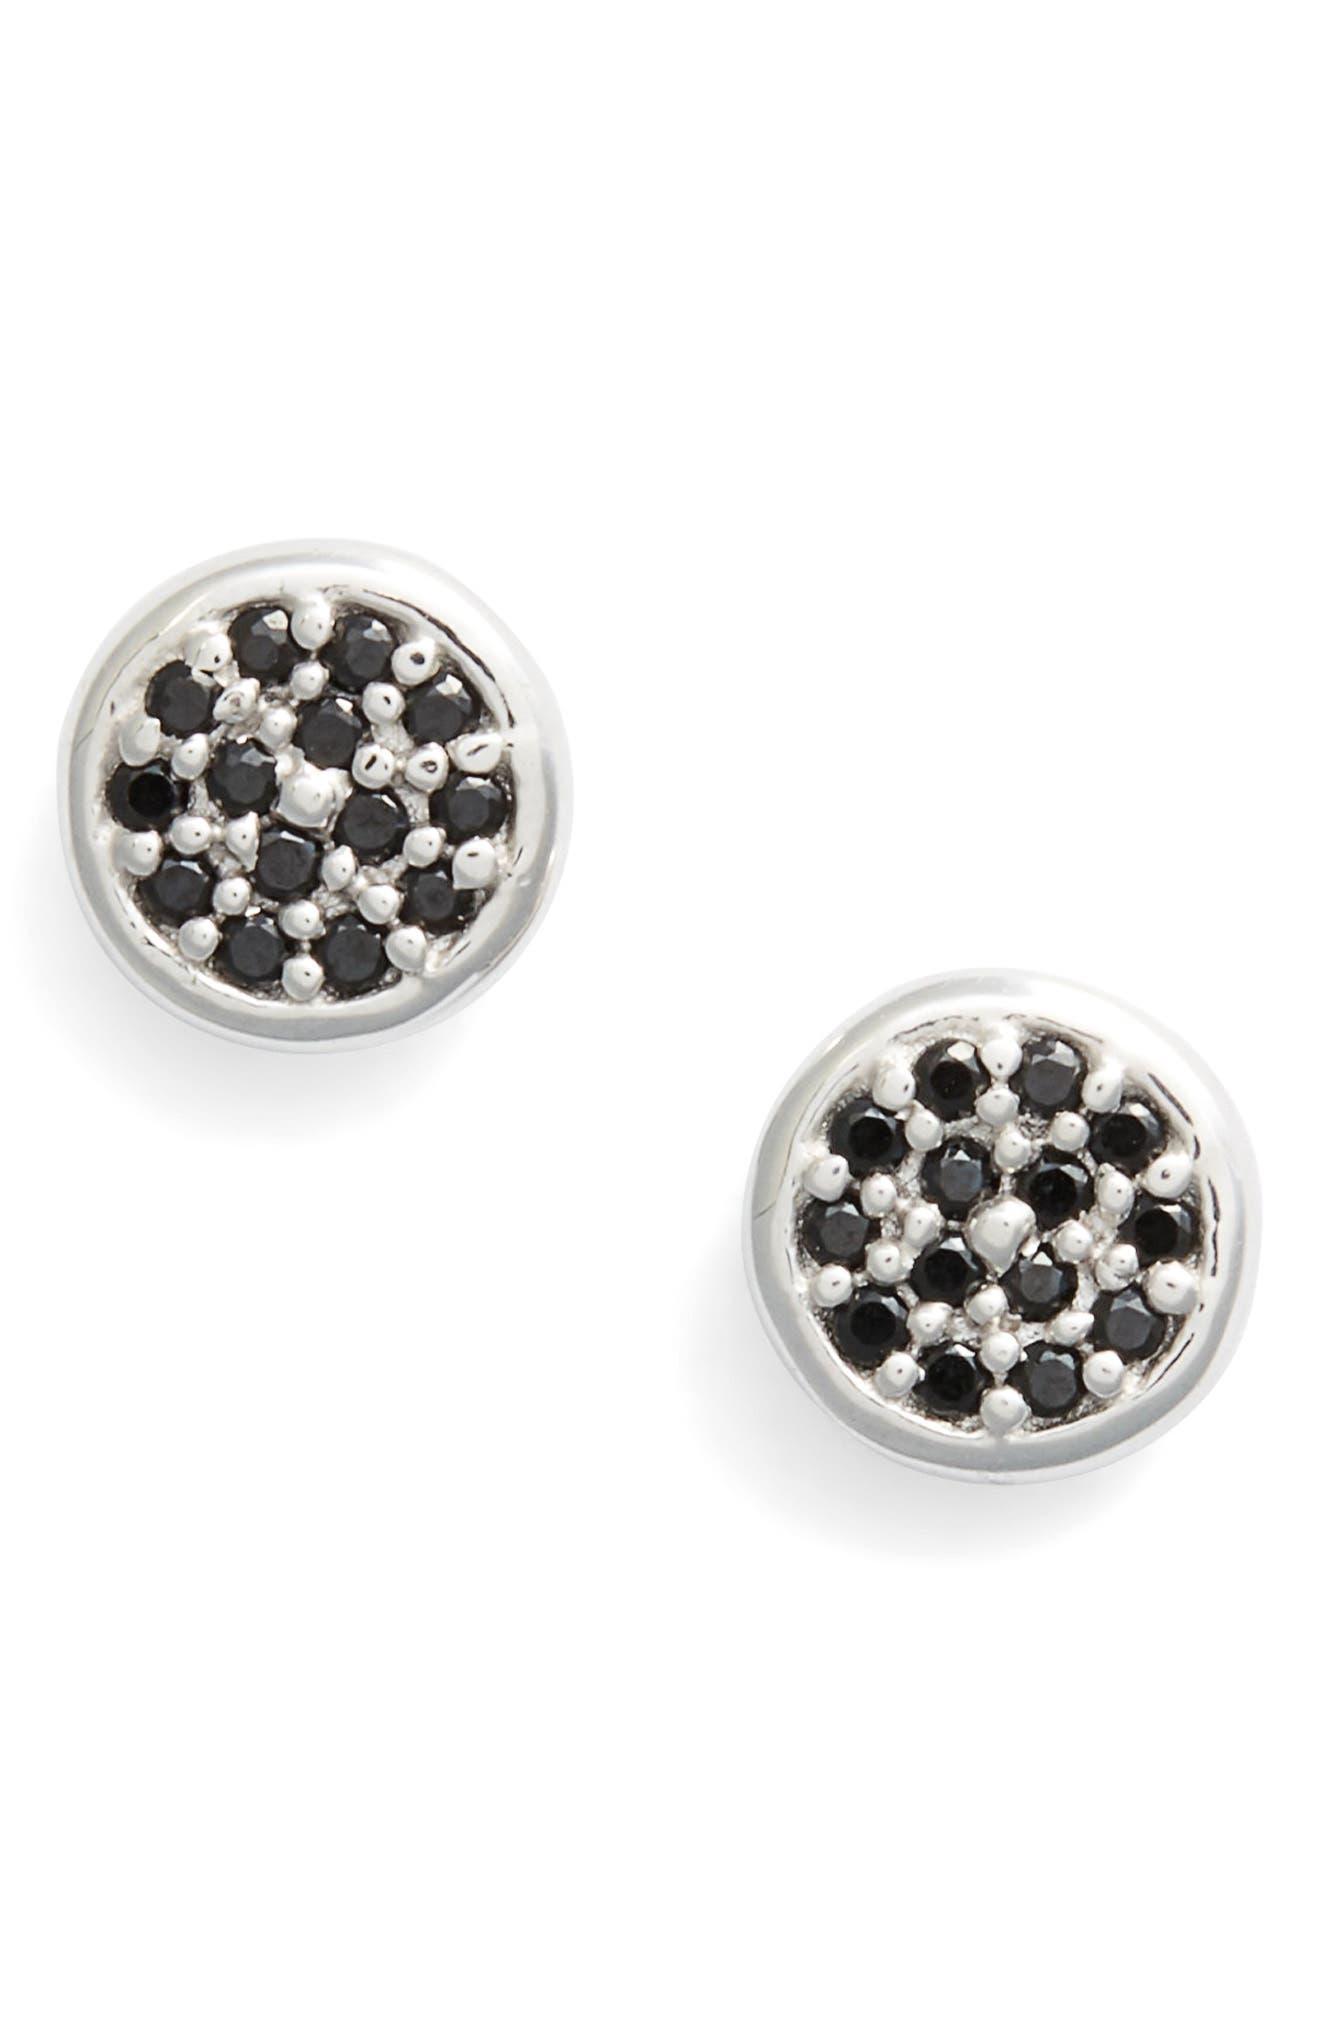 Cubic Zirconia Stud Earrings,                             Main thumbnail 1, color,                             BLACK/ SILVER